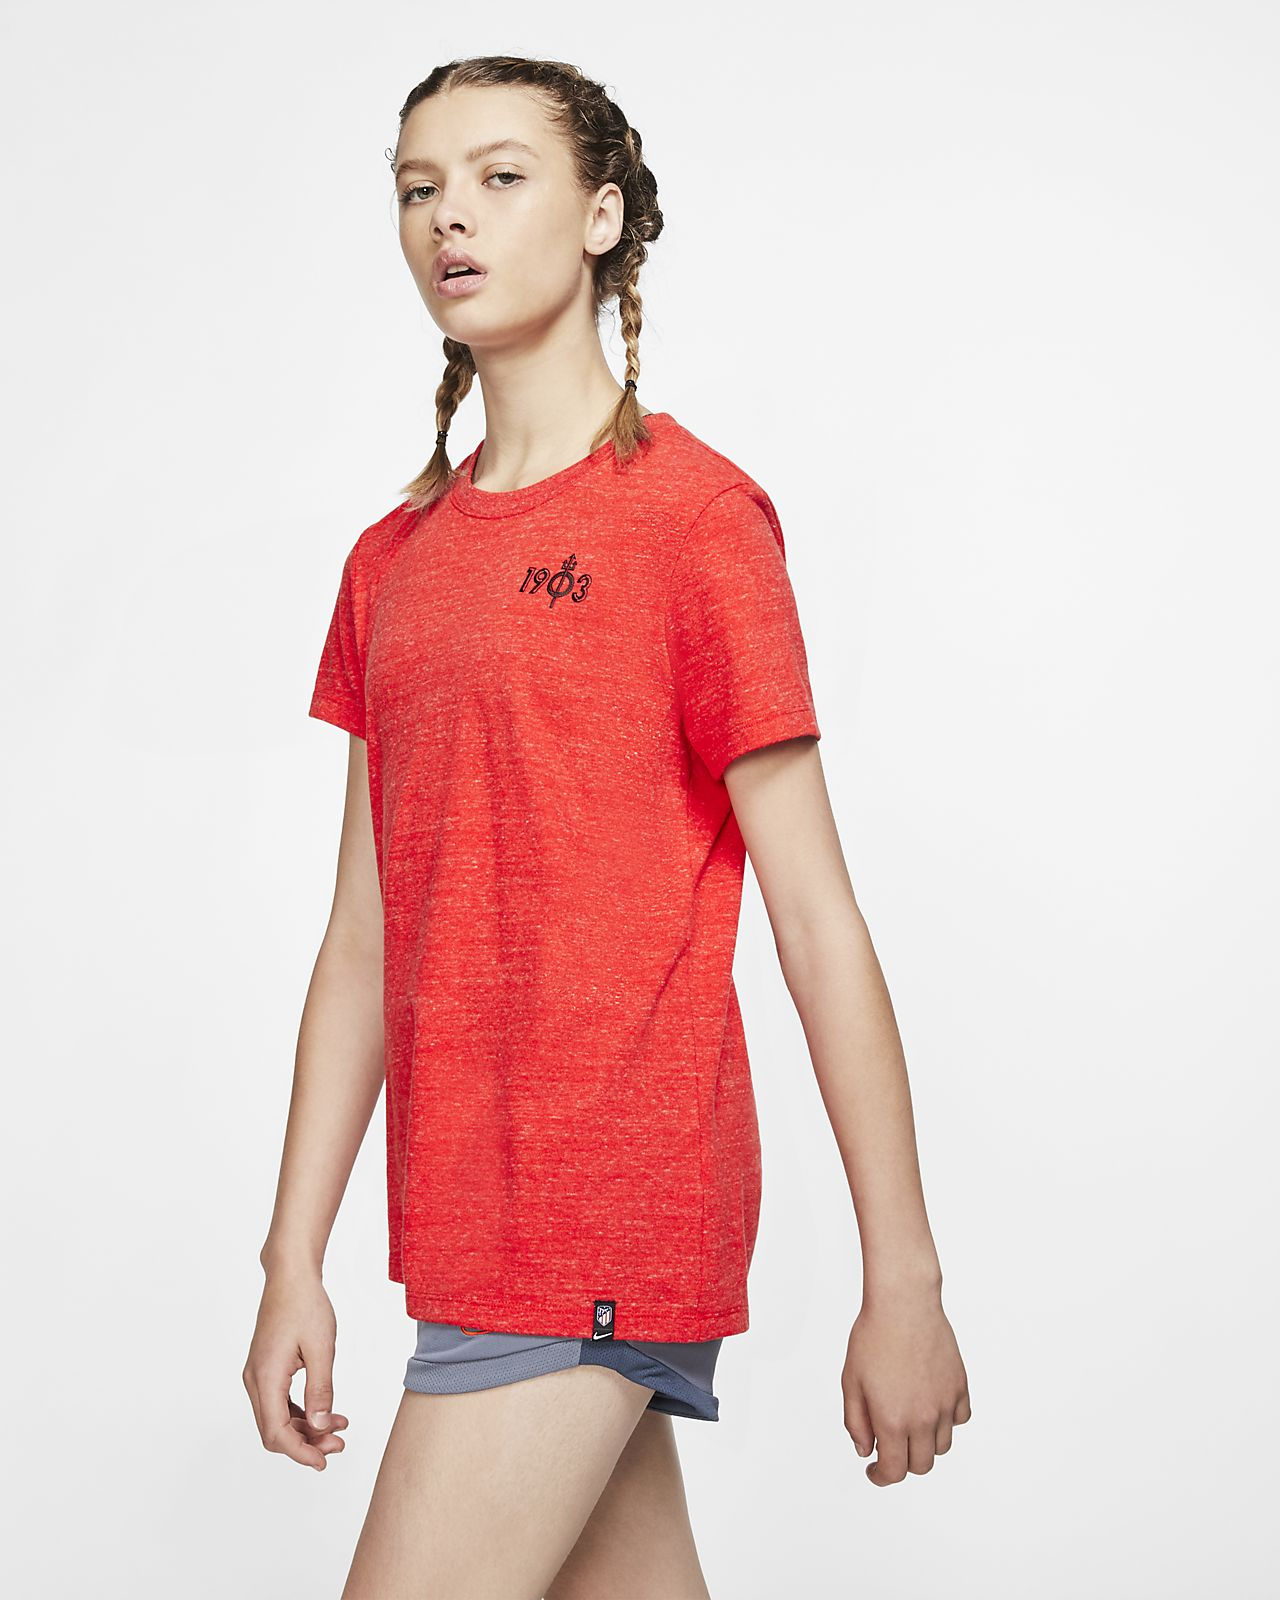 Atlético de Madrid Damen-T-Shirt